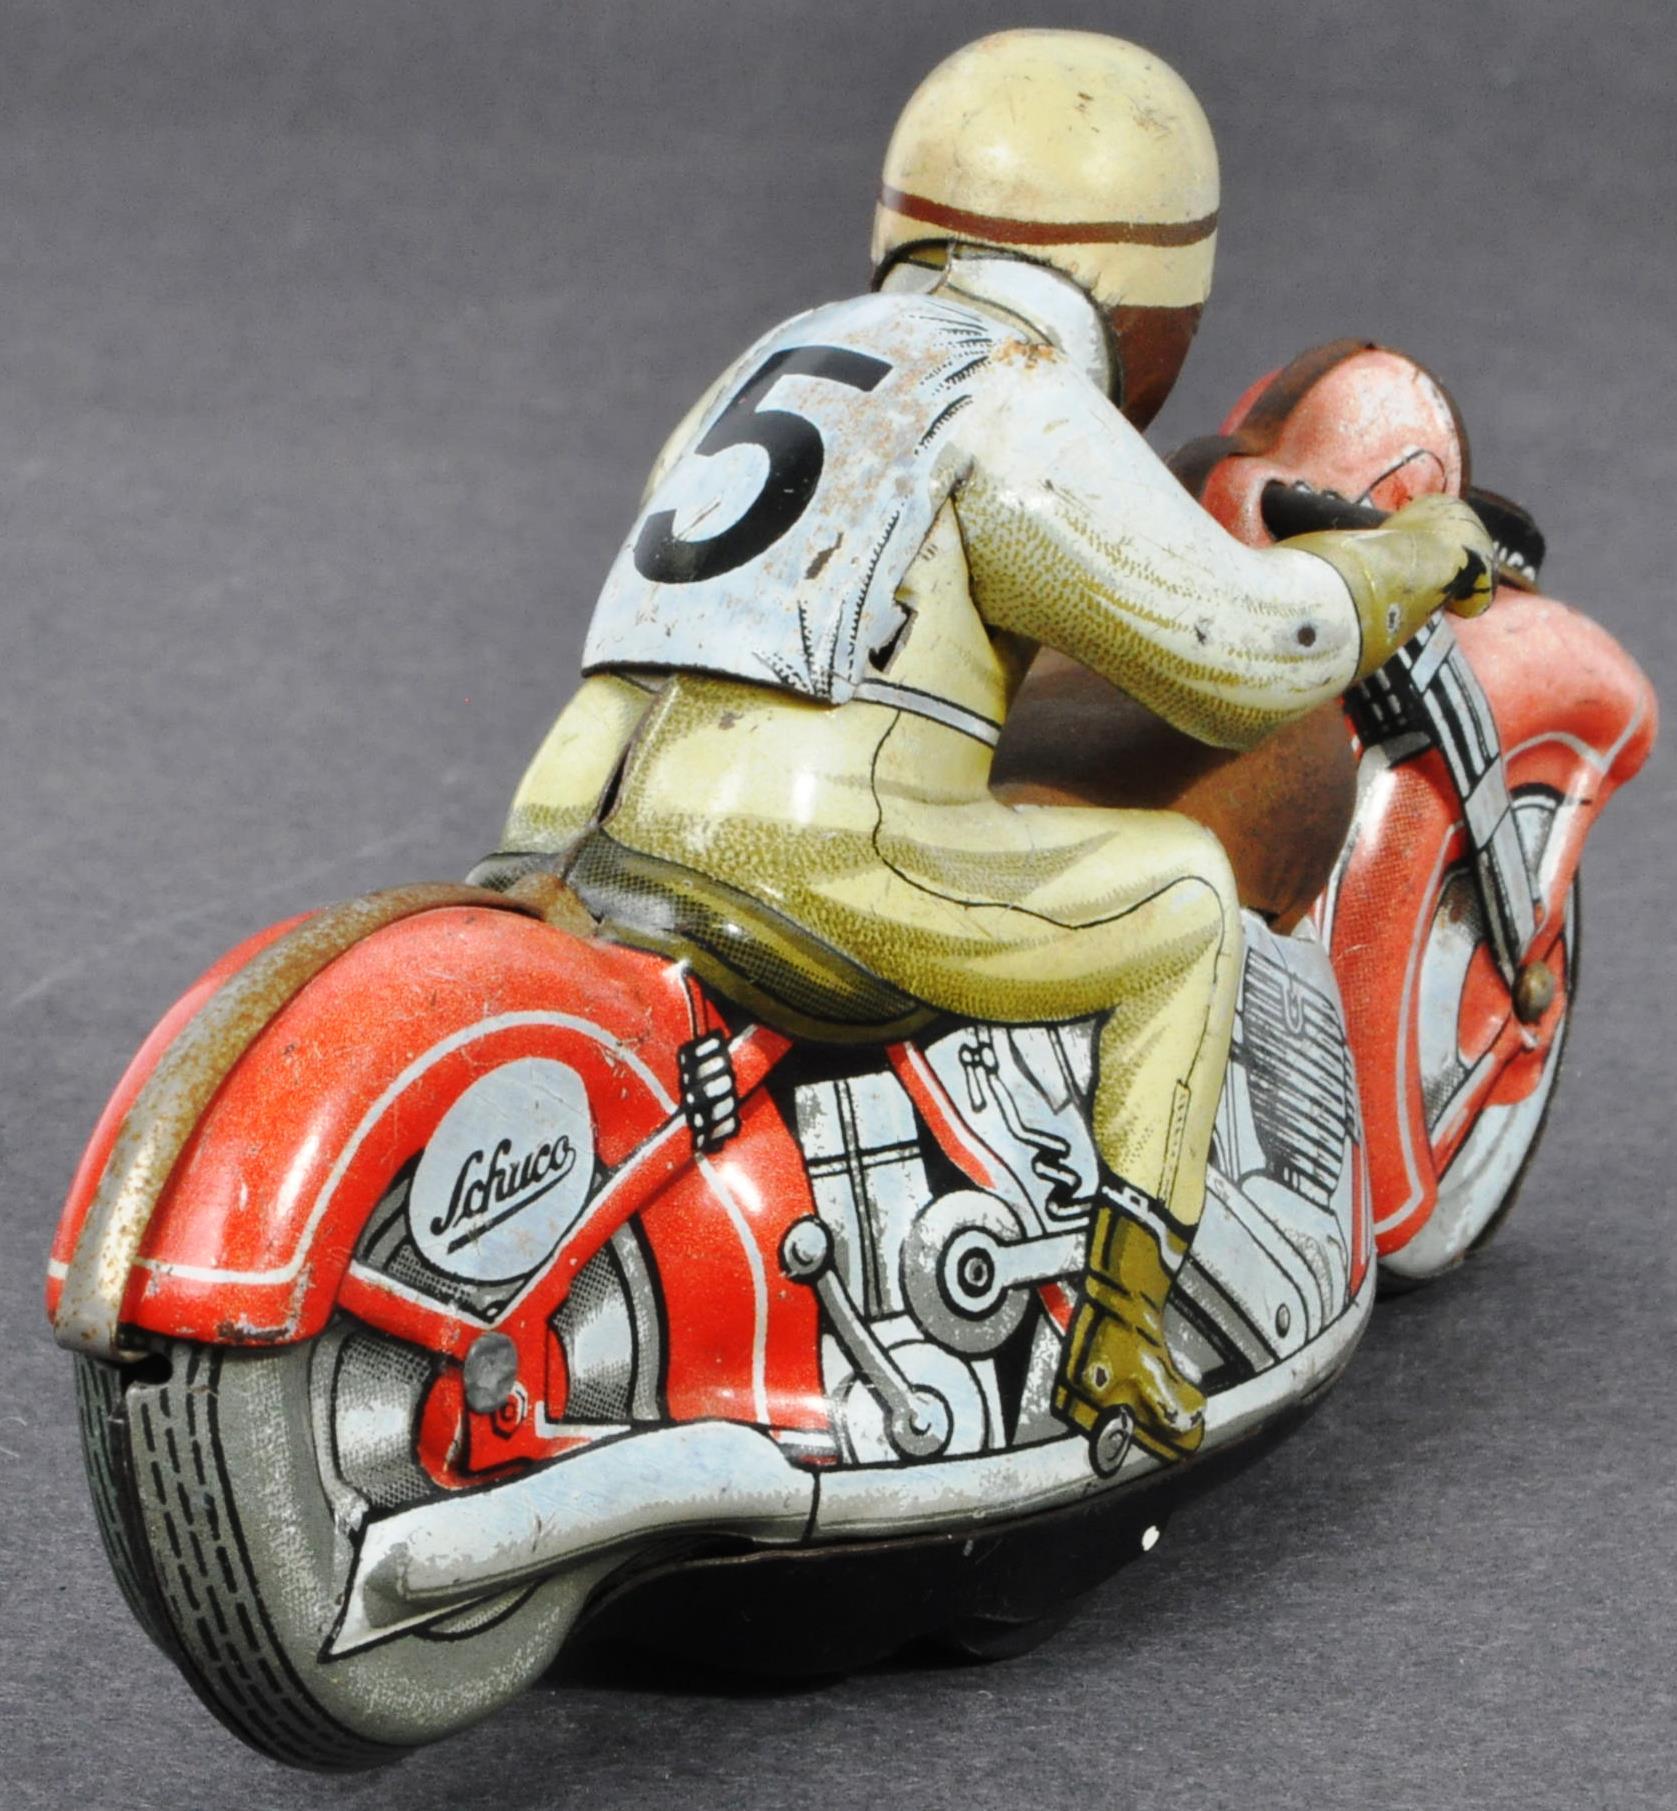 ORIGINAL VINTAGE SCHUCO TINPLATE RACING MOTORCYCLE - Image 4 of 8